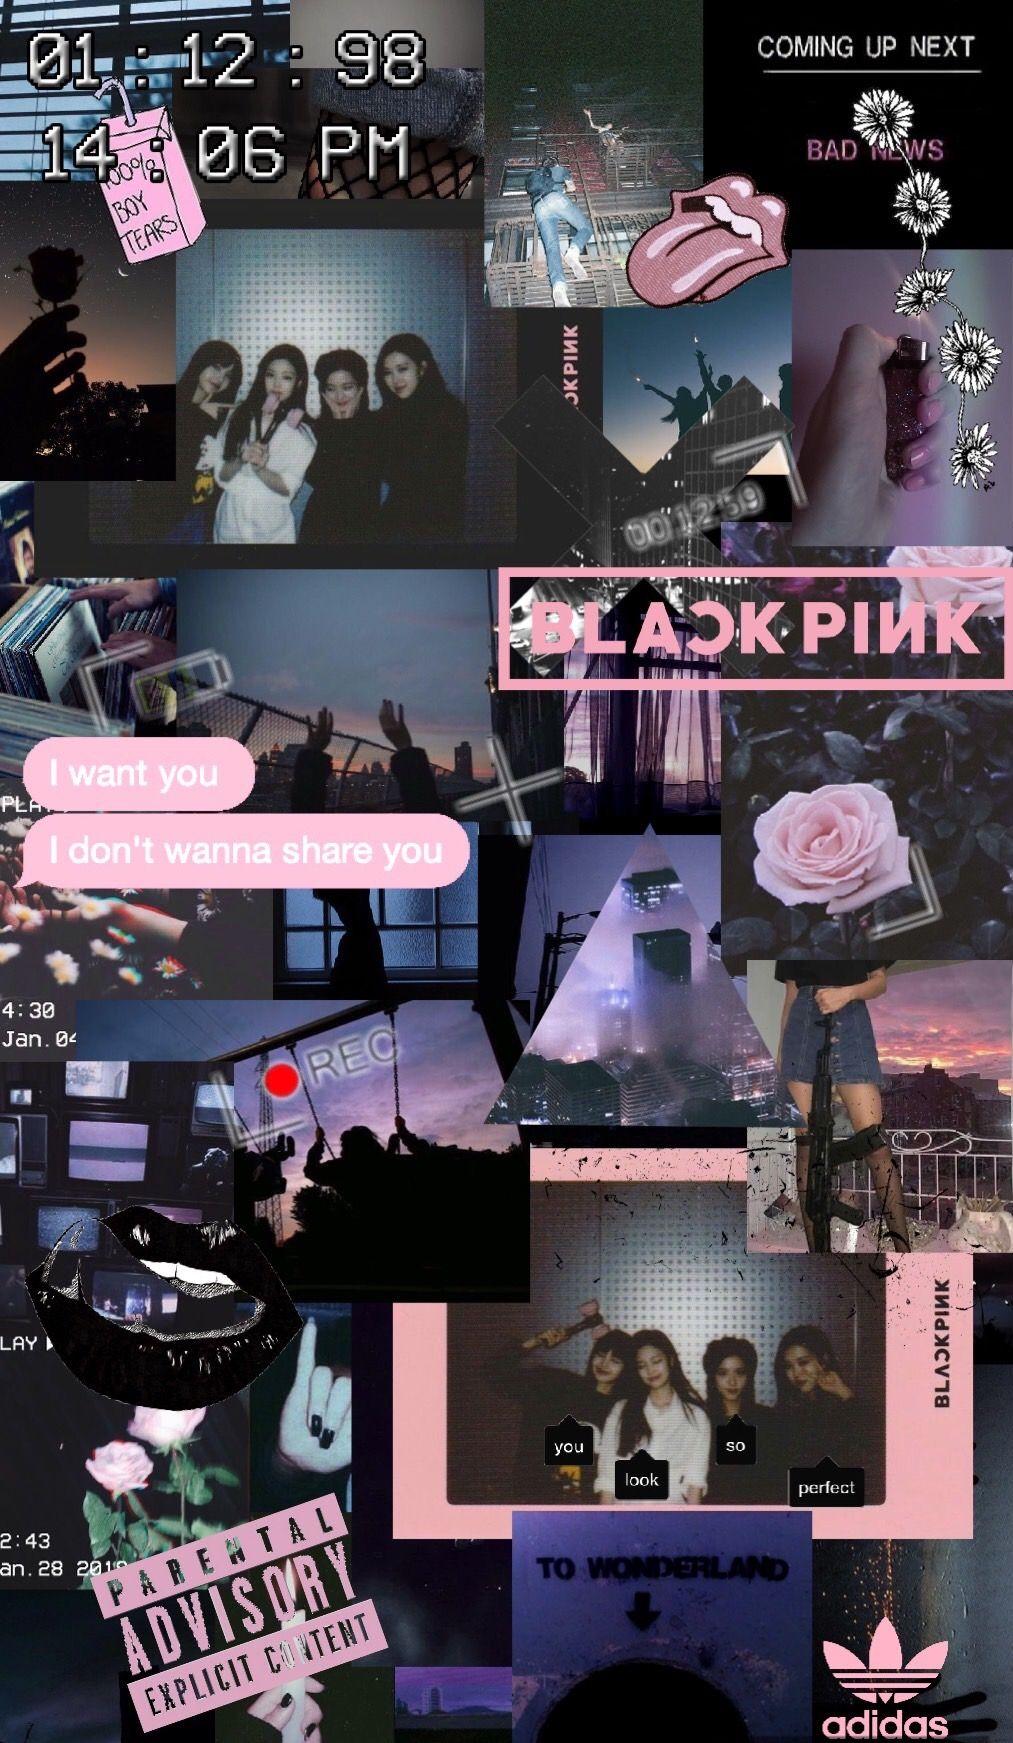 Pin By Love Jungkook On Blackpink Blackpink Wallpaper Kpop